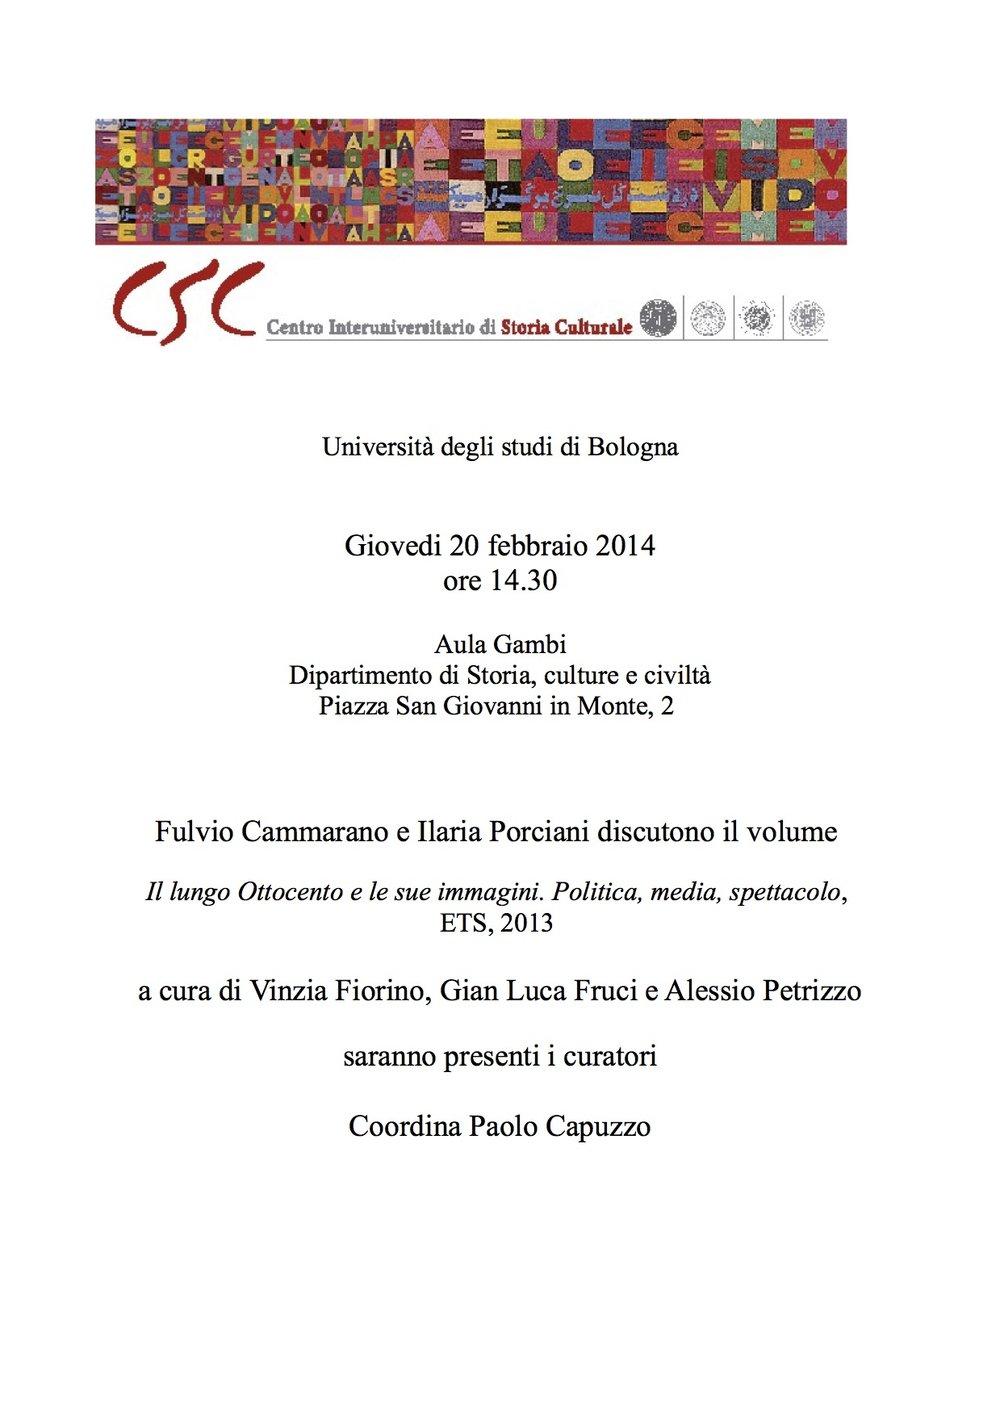 Locandina+Lungo+Ottocento.jpg